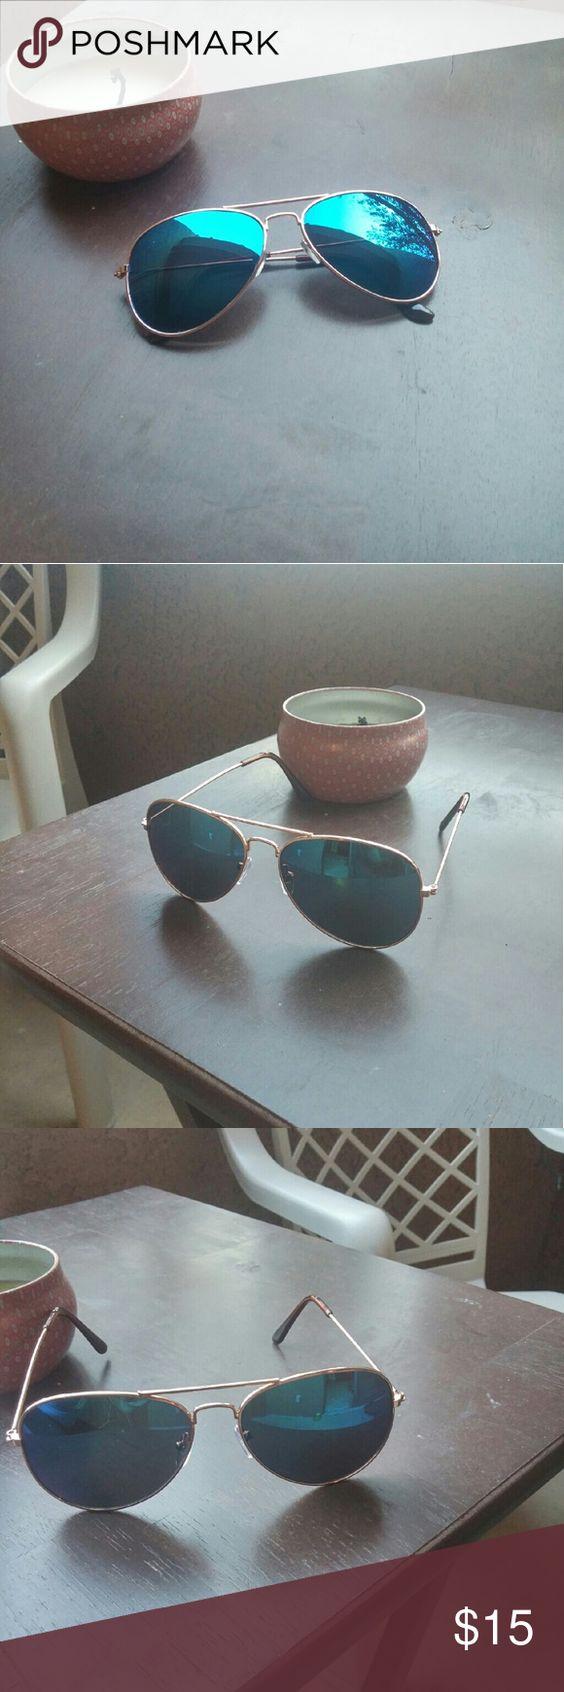 New Blue Mirrored Aviators New in package! Unisex aviators in a mirrored blue finish, UV400 Accessories Sunglasses